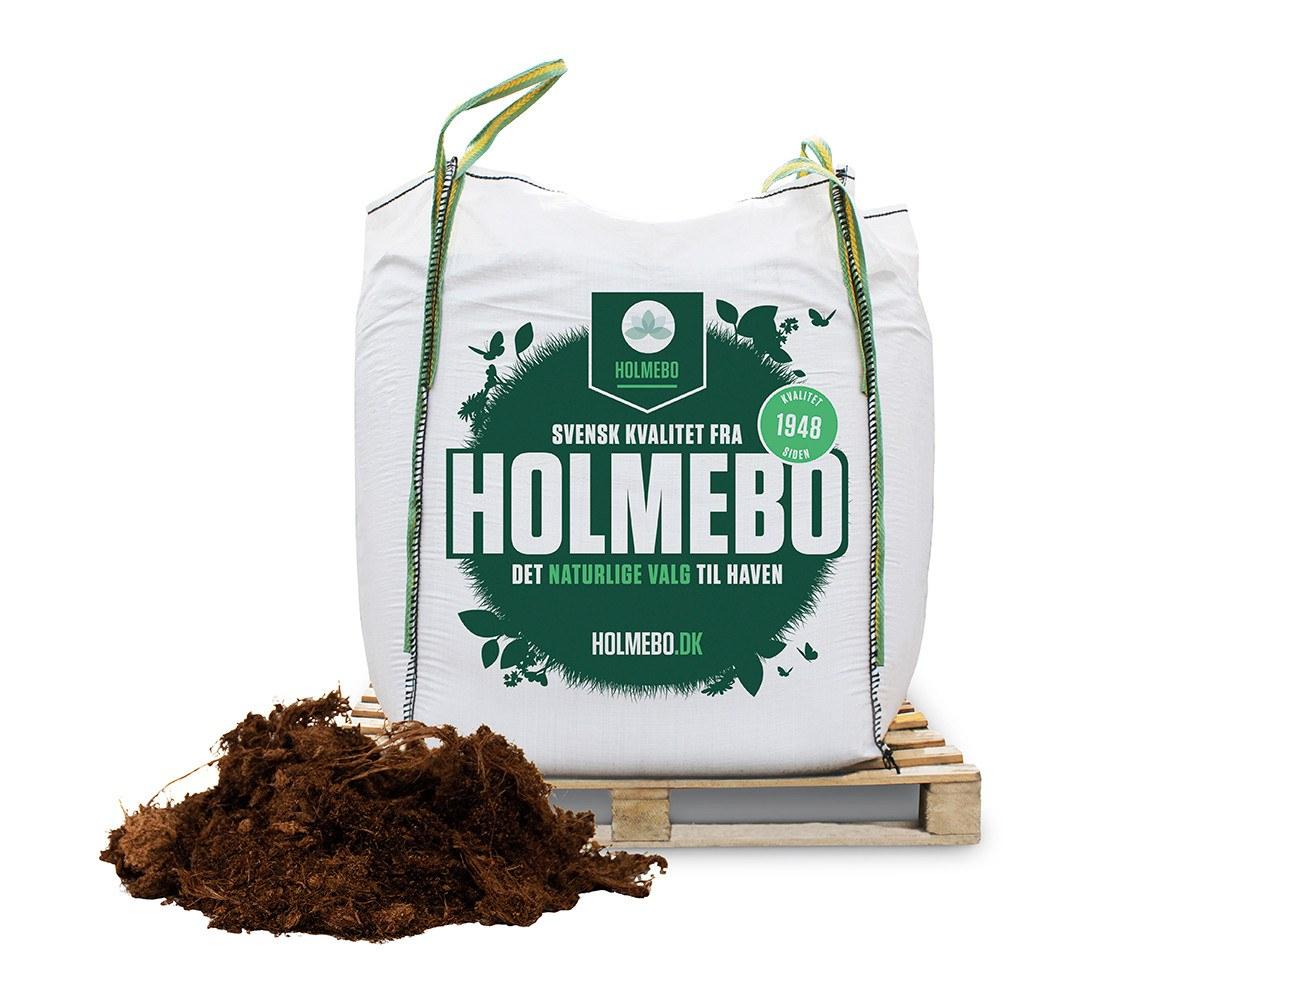 Holmebo Surbundsjord - Bigbag á 1000 liter